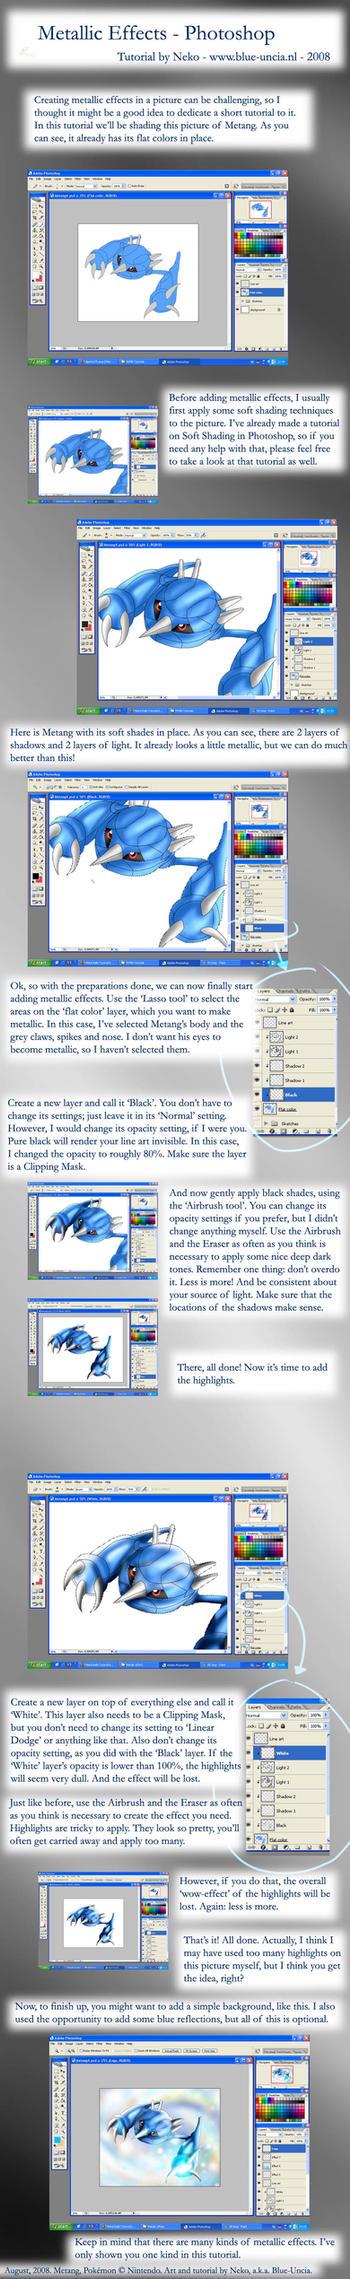 Metallic effects tutorial by Blue-Uncia